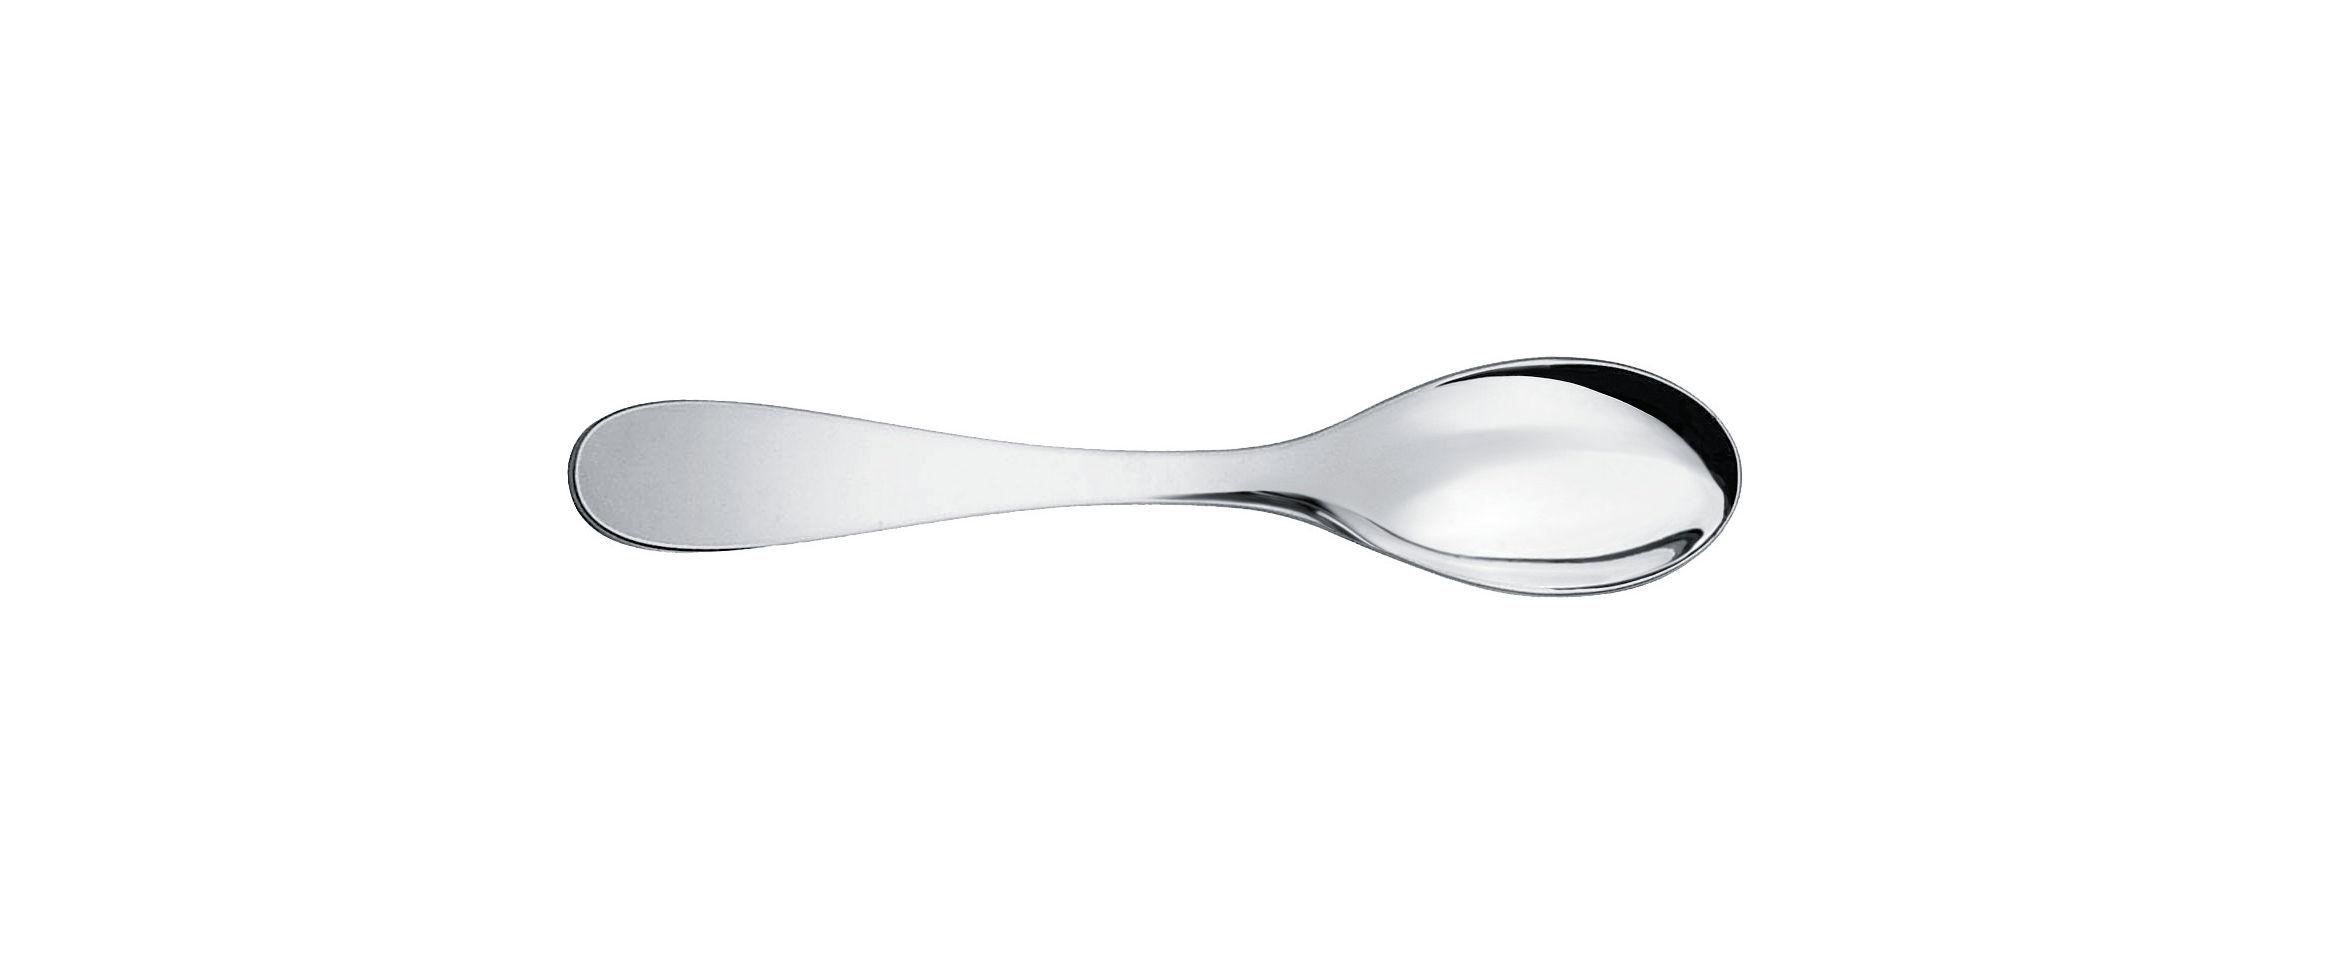 Tableware - Cutlery - Eat.it Coffee, tea spoon by Alessi - Coffe / L 12,7 cm - Stainless steel 18/10